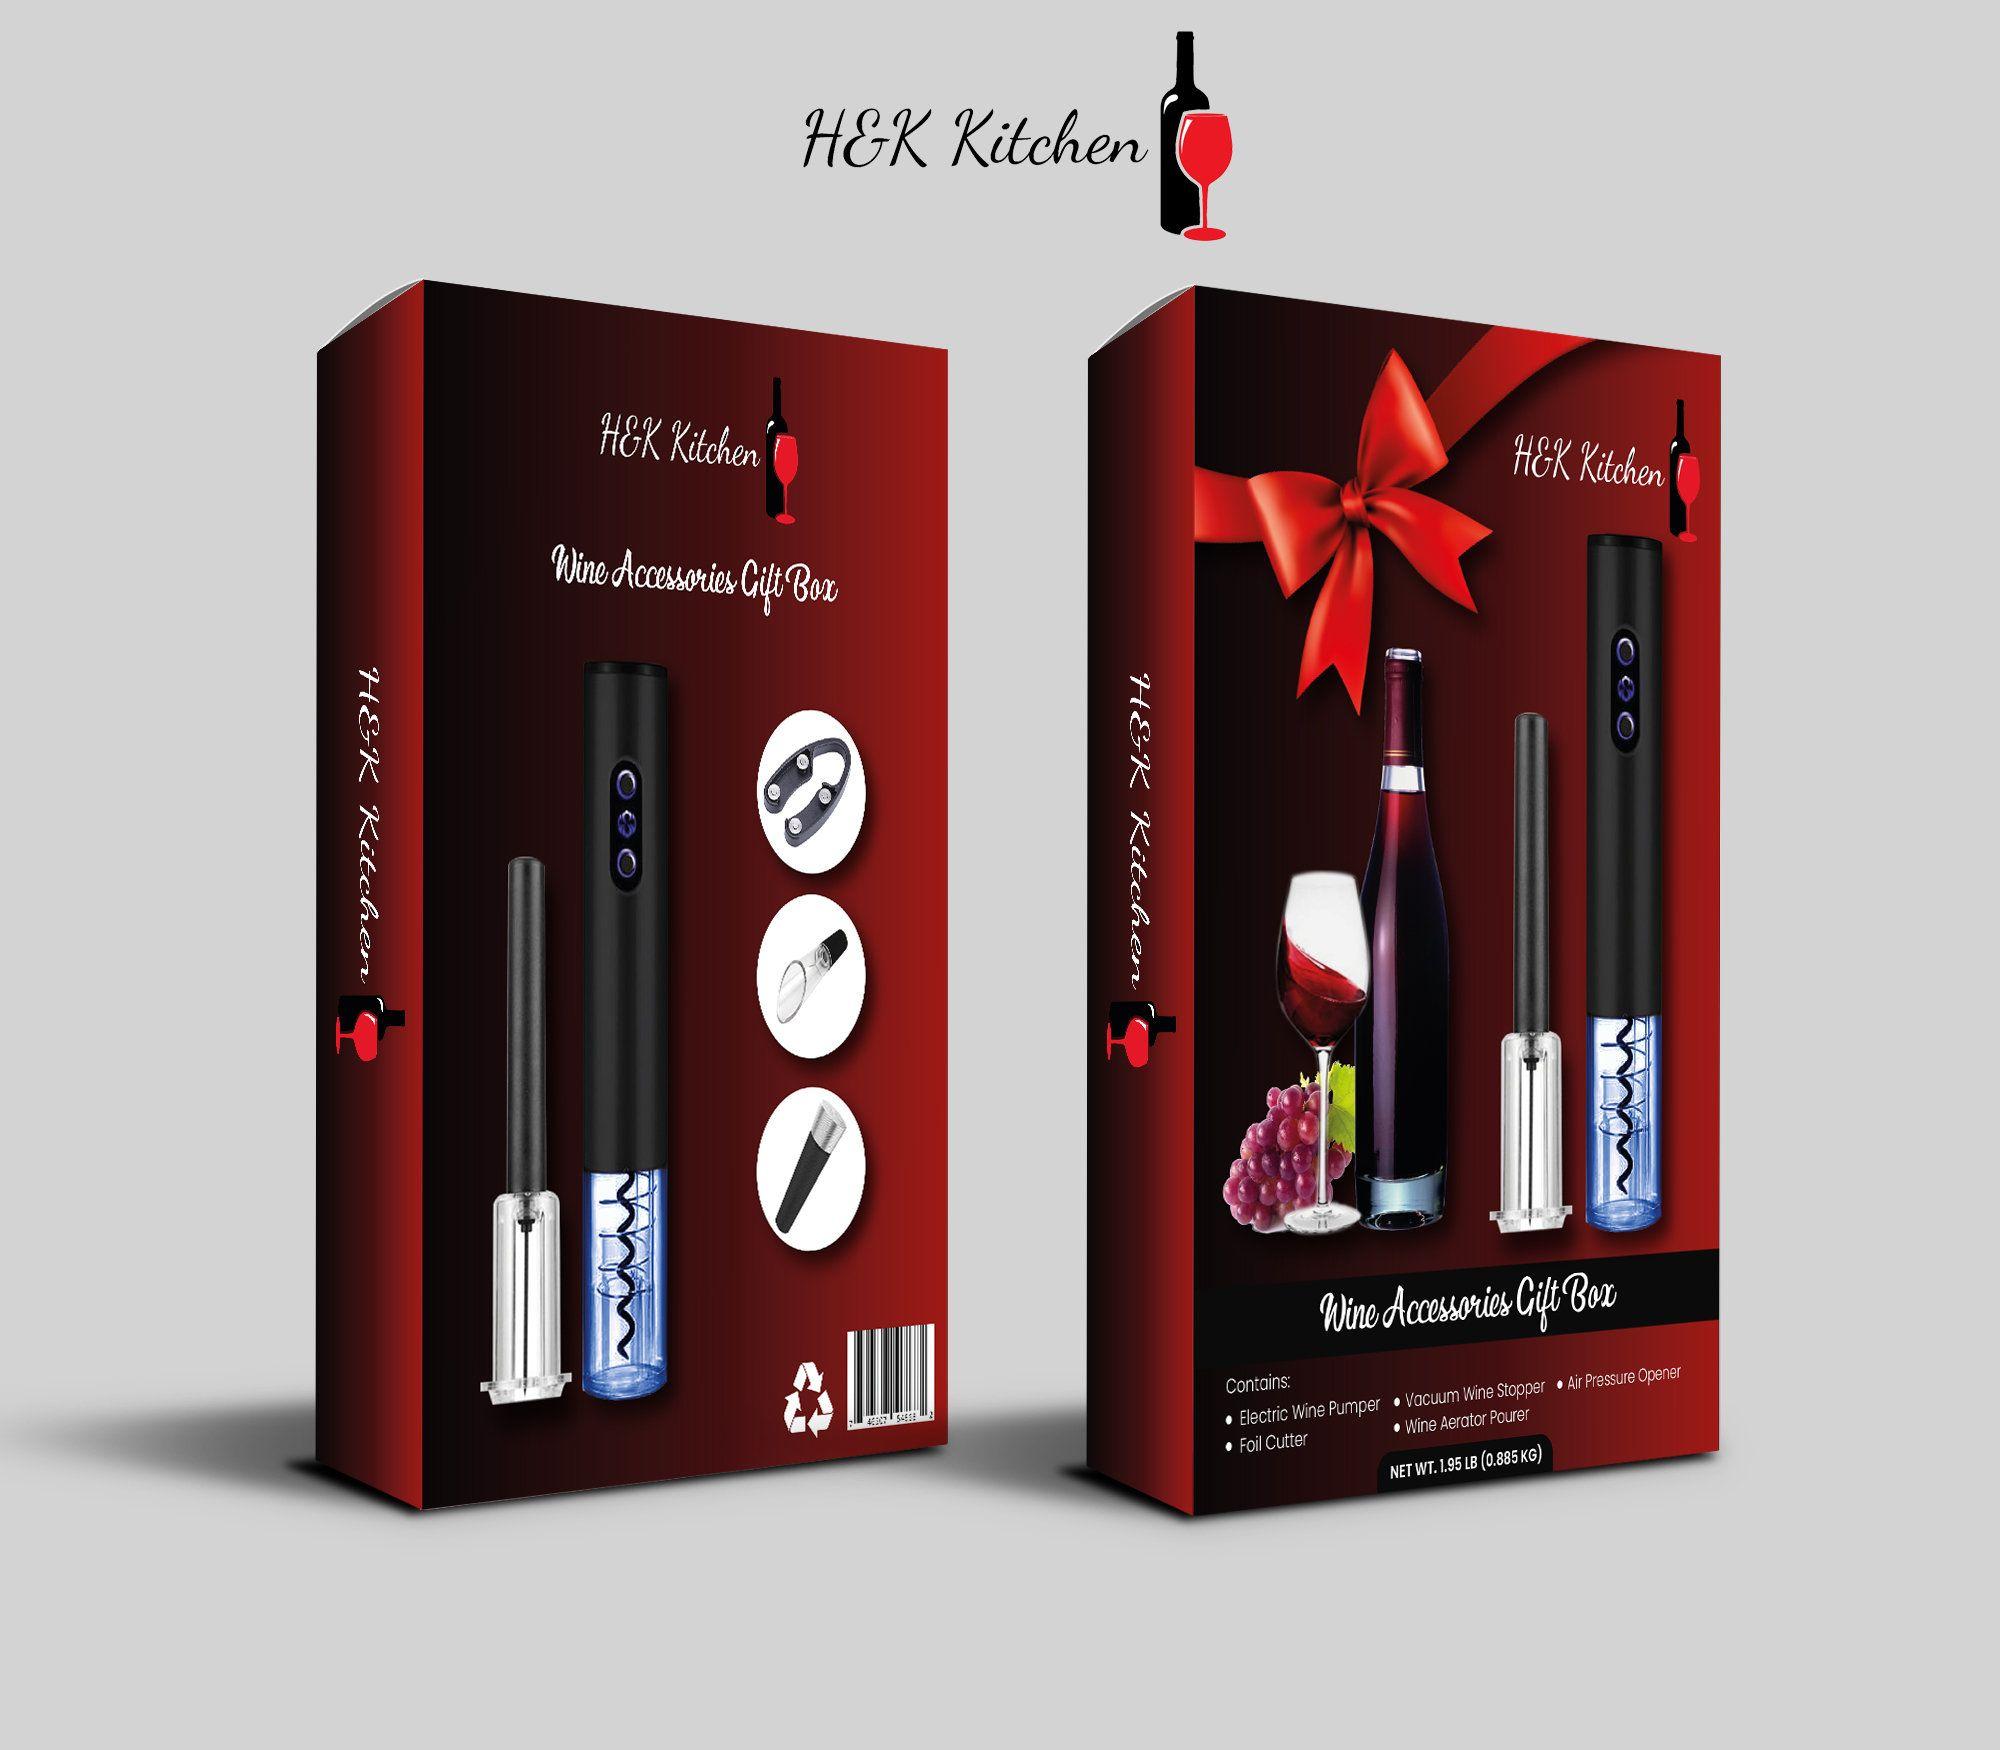 H K Kitchen Premium Cordless Bottle Electric Wine Opener 4 In 1 In 2020 Electric Wine Bottle Opener Electric Wine Opener Wine Opener Gift